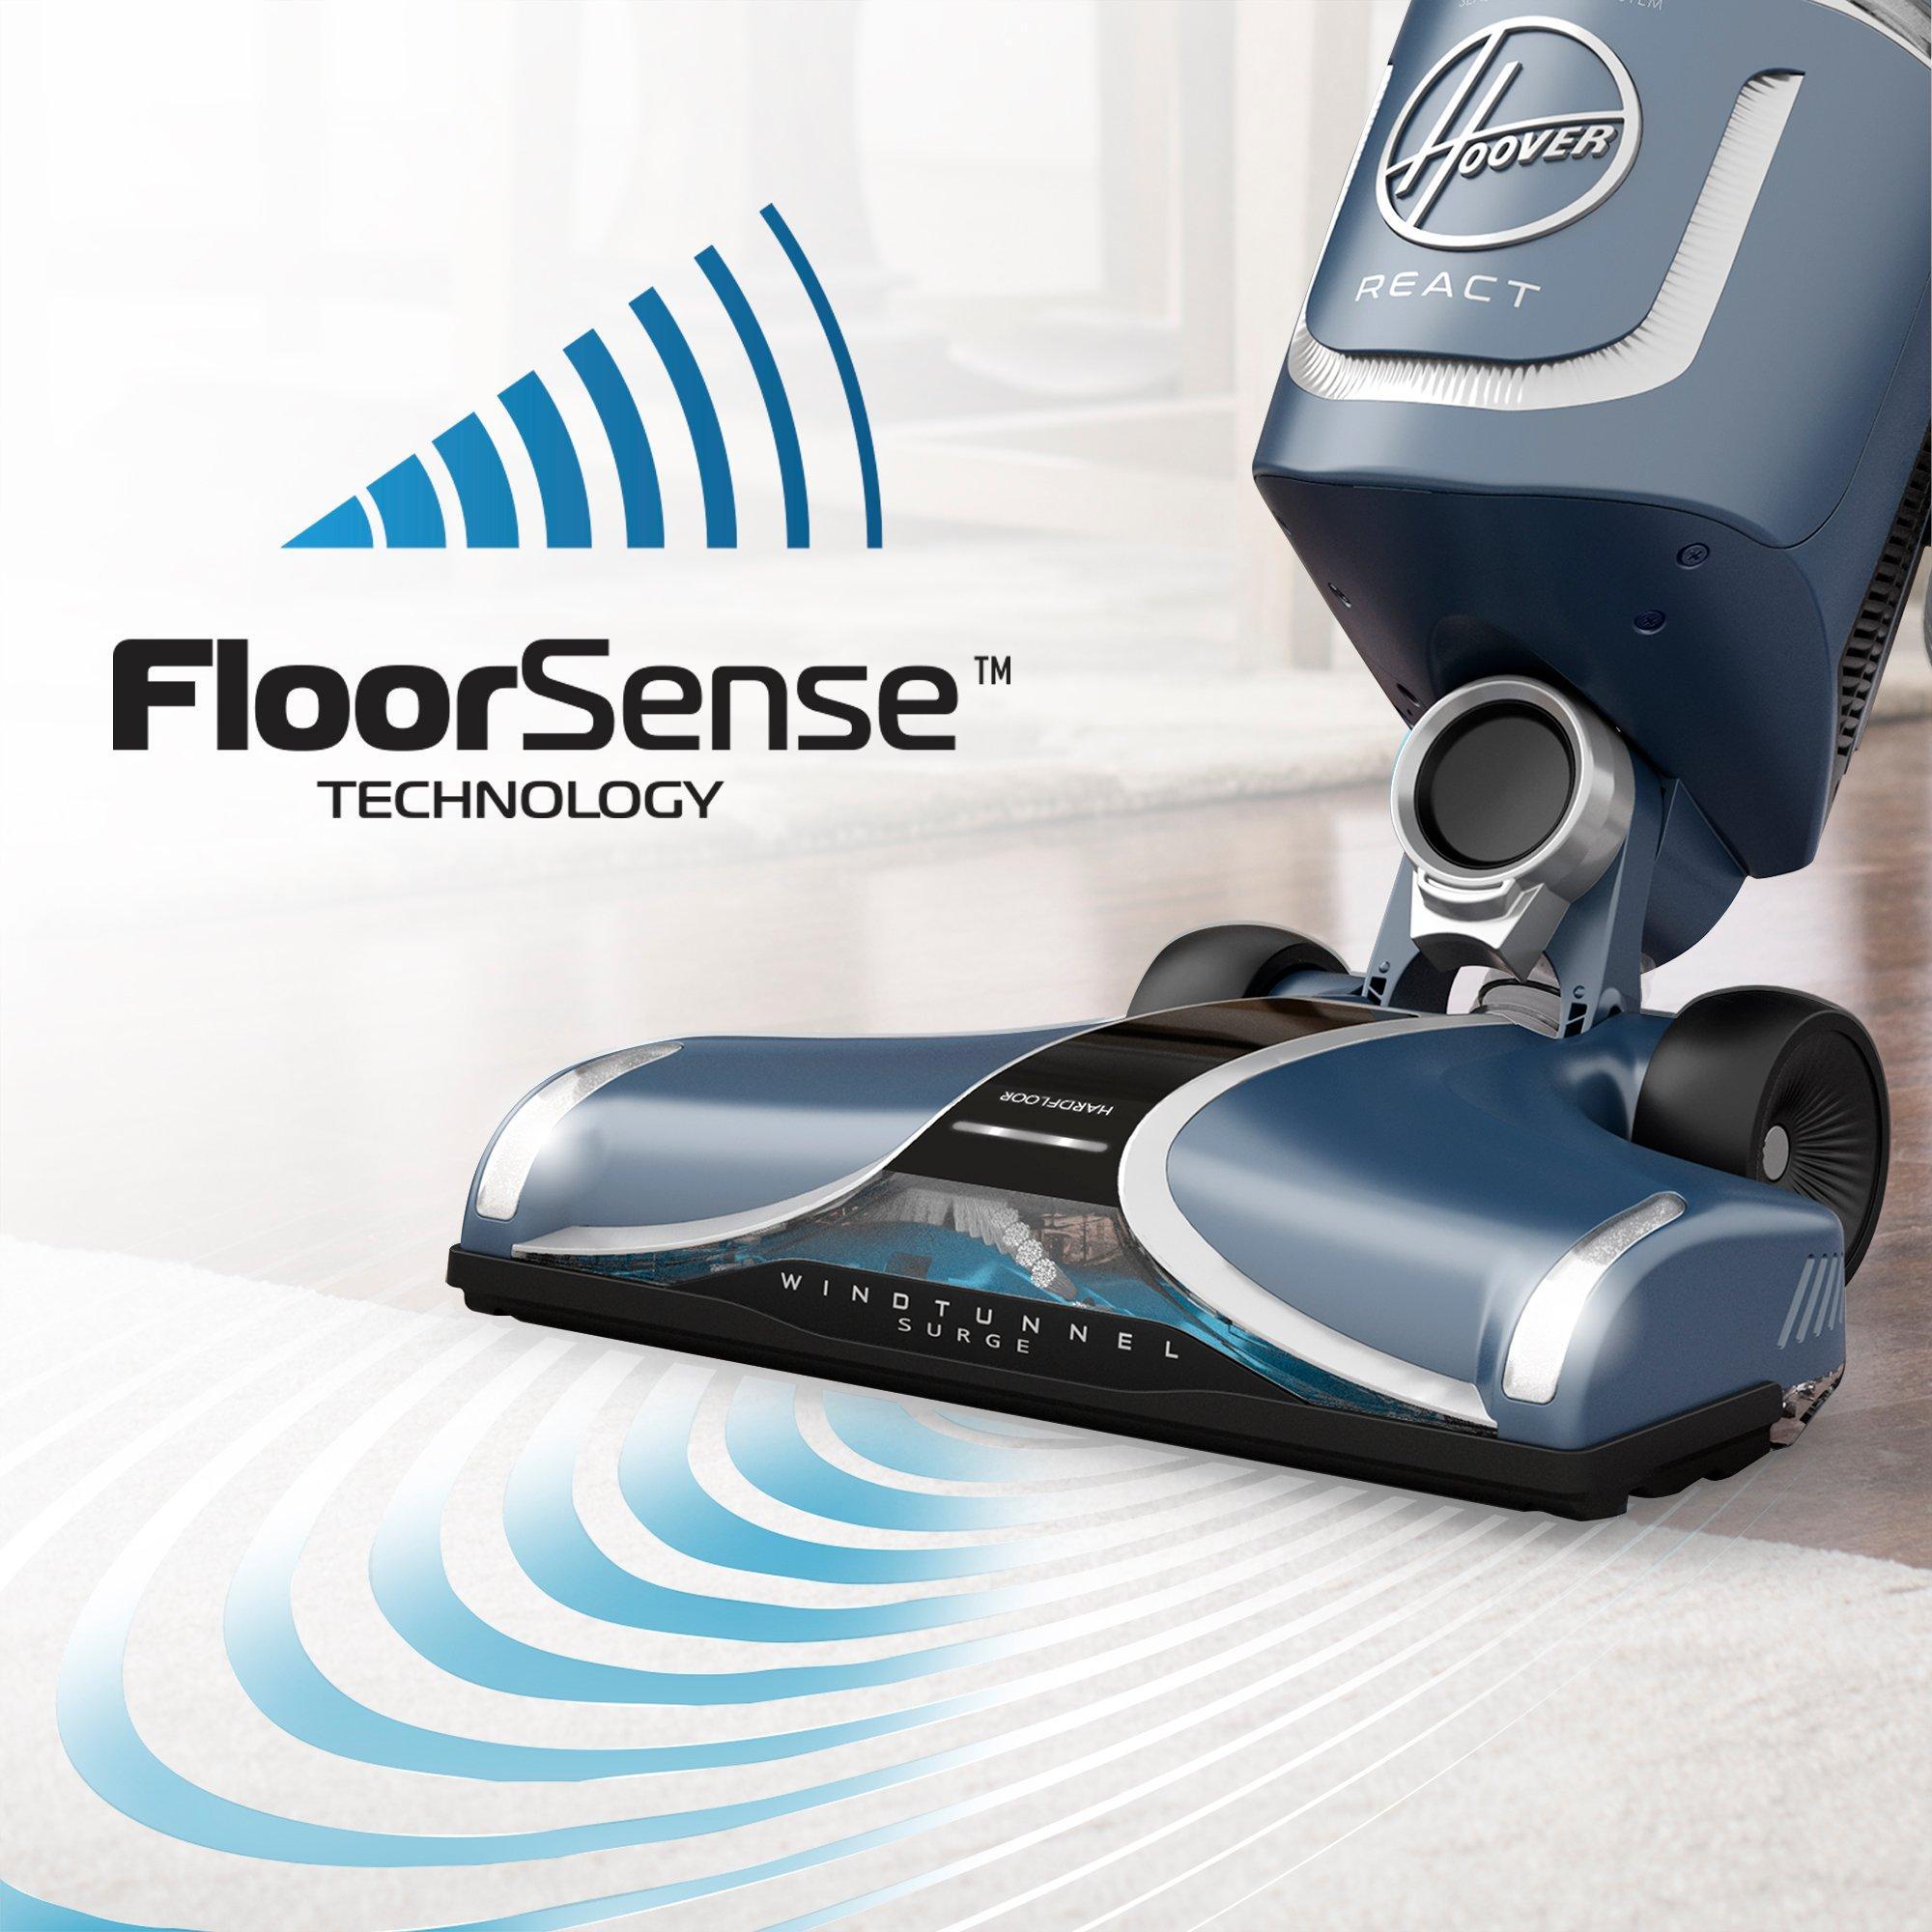 Hoover React Professional Pet Plus Upright Vacuum Cleaner